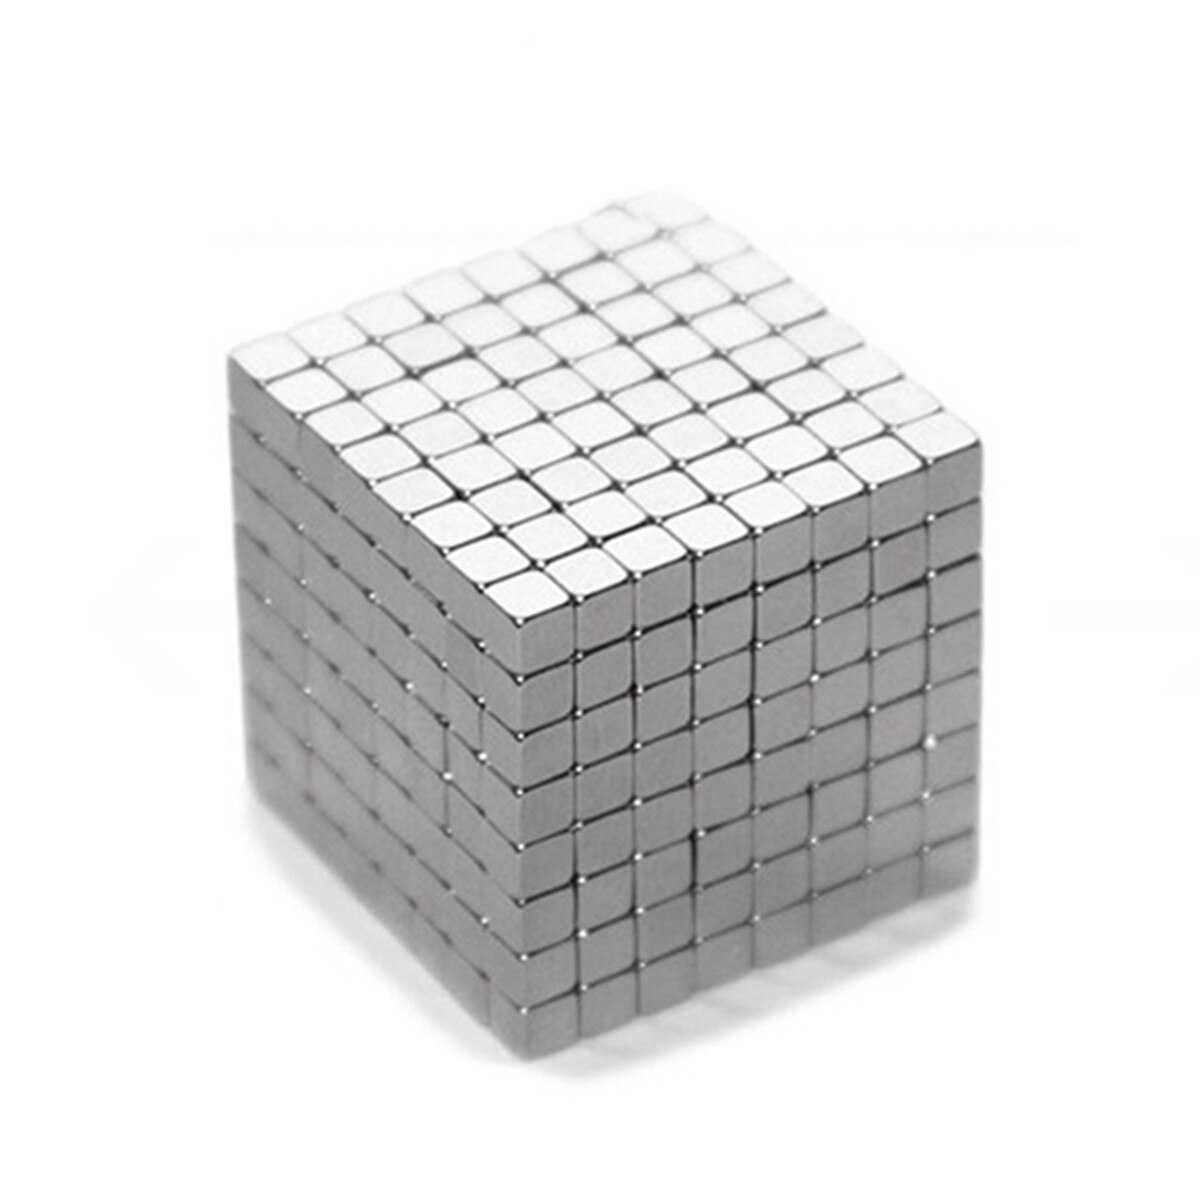 3mm 125 Pcs Poderosos ímanes de Terras Raras de Neodímio Ímãs Quadrados Bloco Cubo DIY Educacional Brinquedo Cubo Magnético Criatividade Brinquedo Intelectual